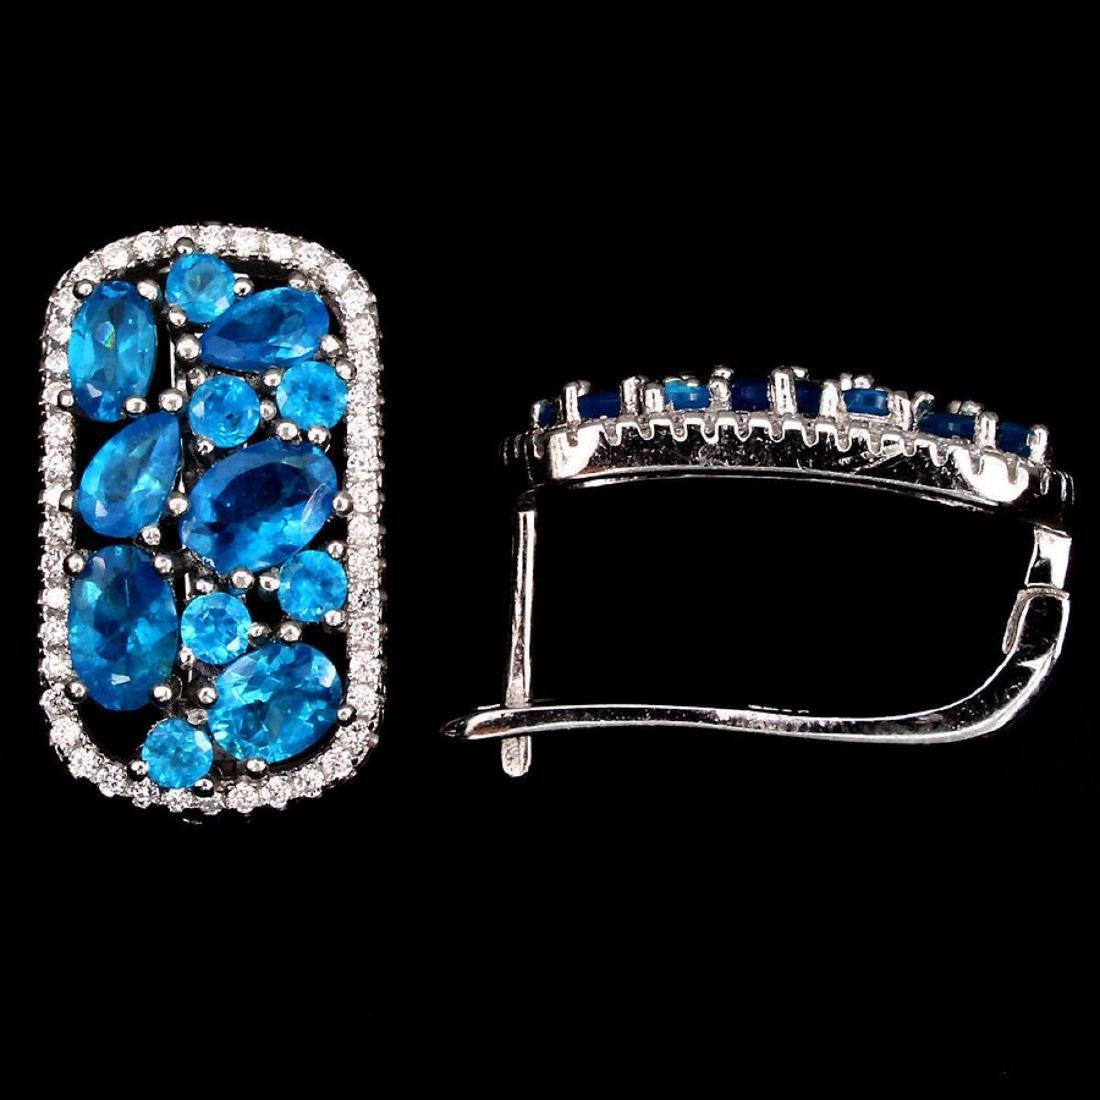 Natural Paraiba Blue Apatite Earrings - 2